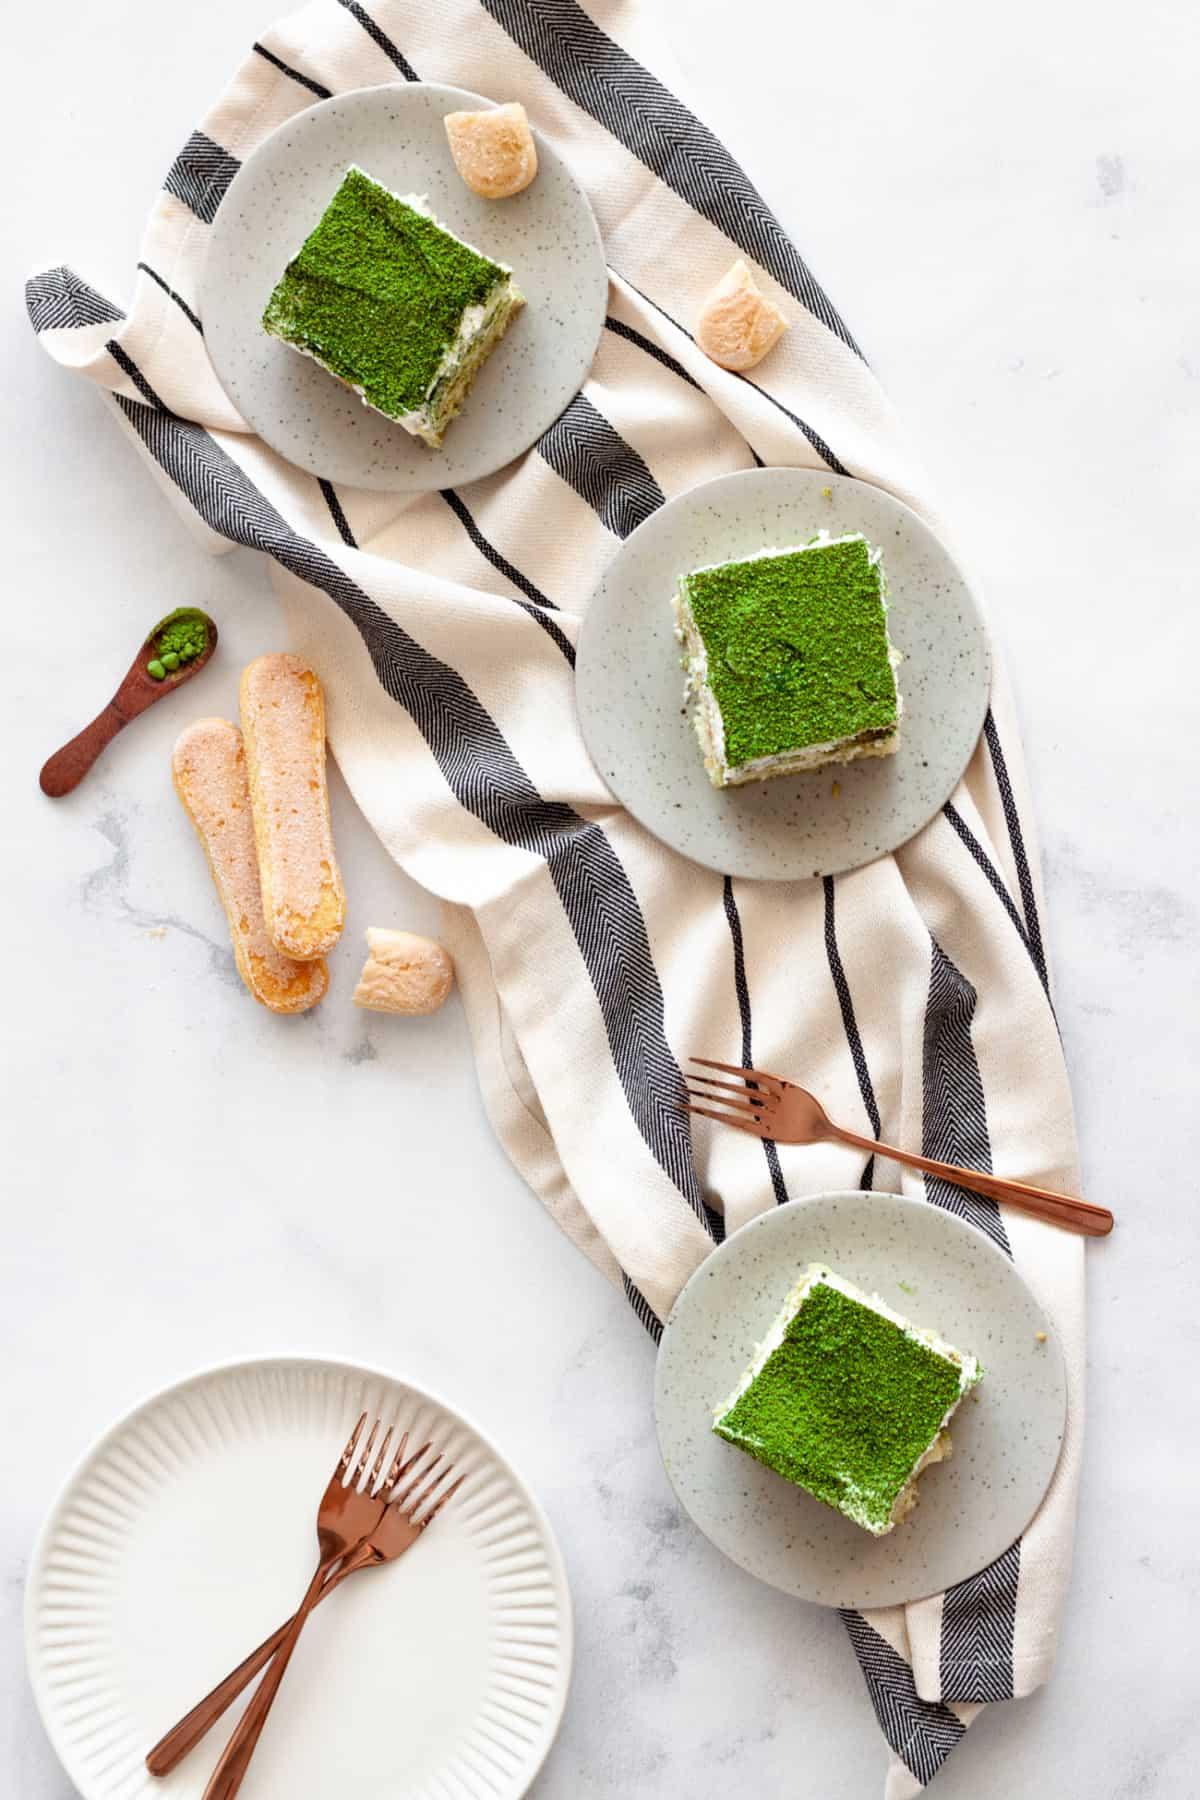 vertical image of three servings of matcha tiramisu